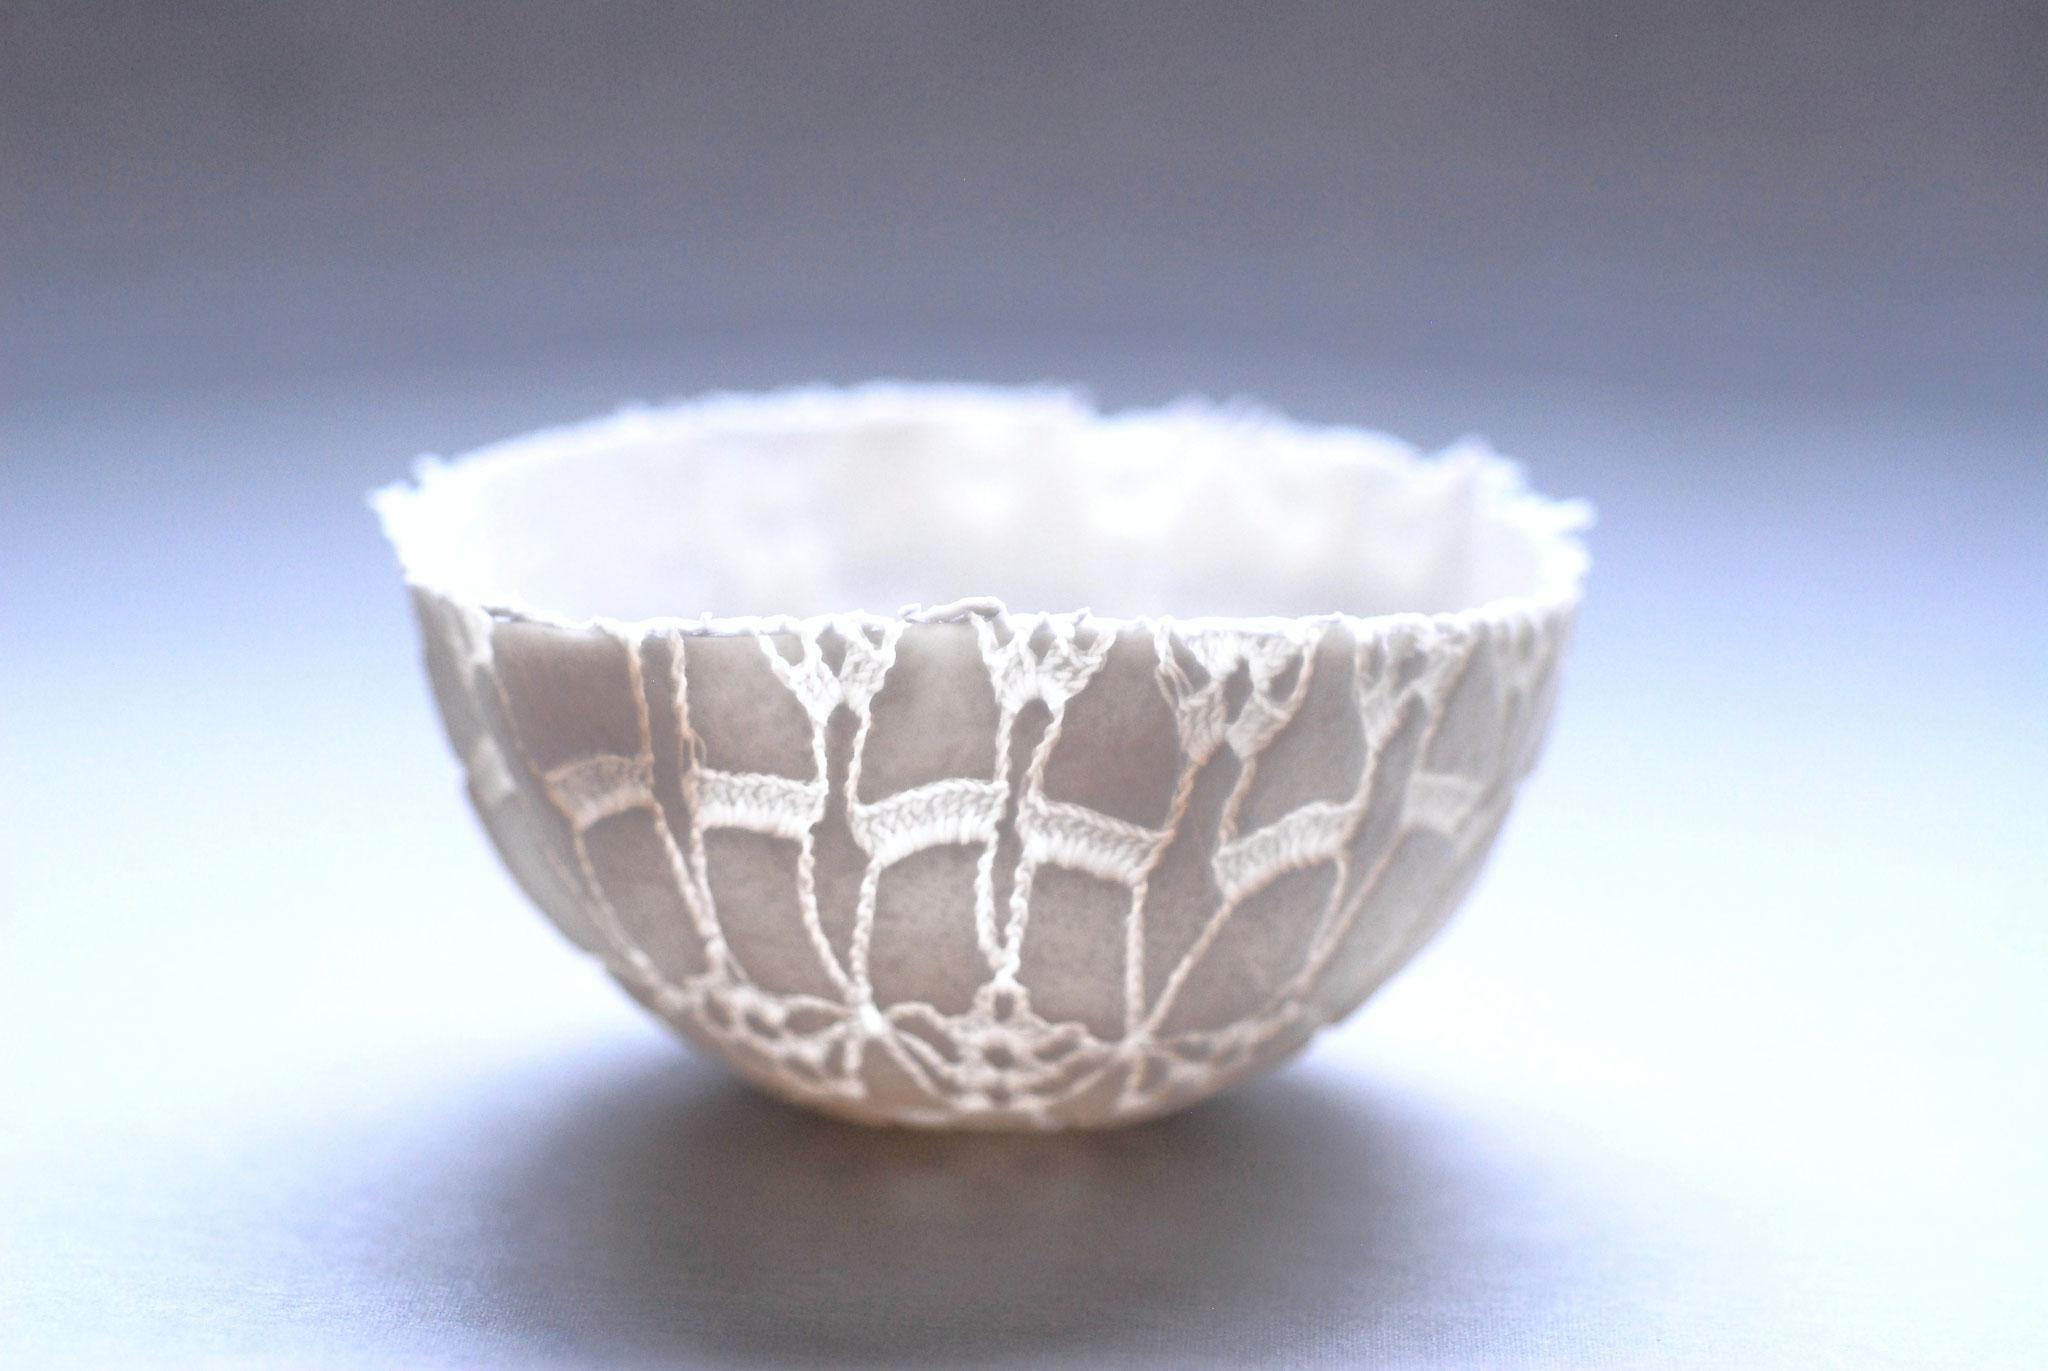 Porzellanobjekt antike Spitze d: 9 cm Euro 30,00